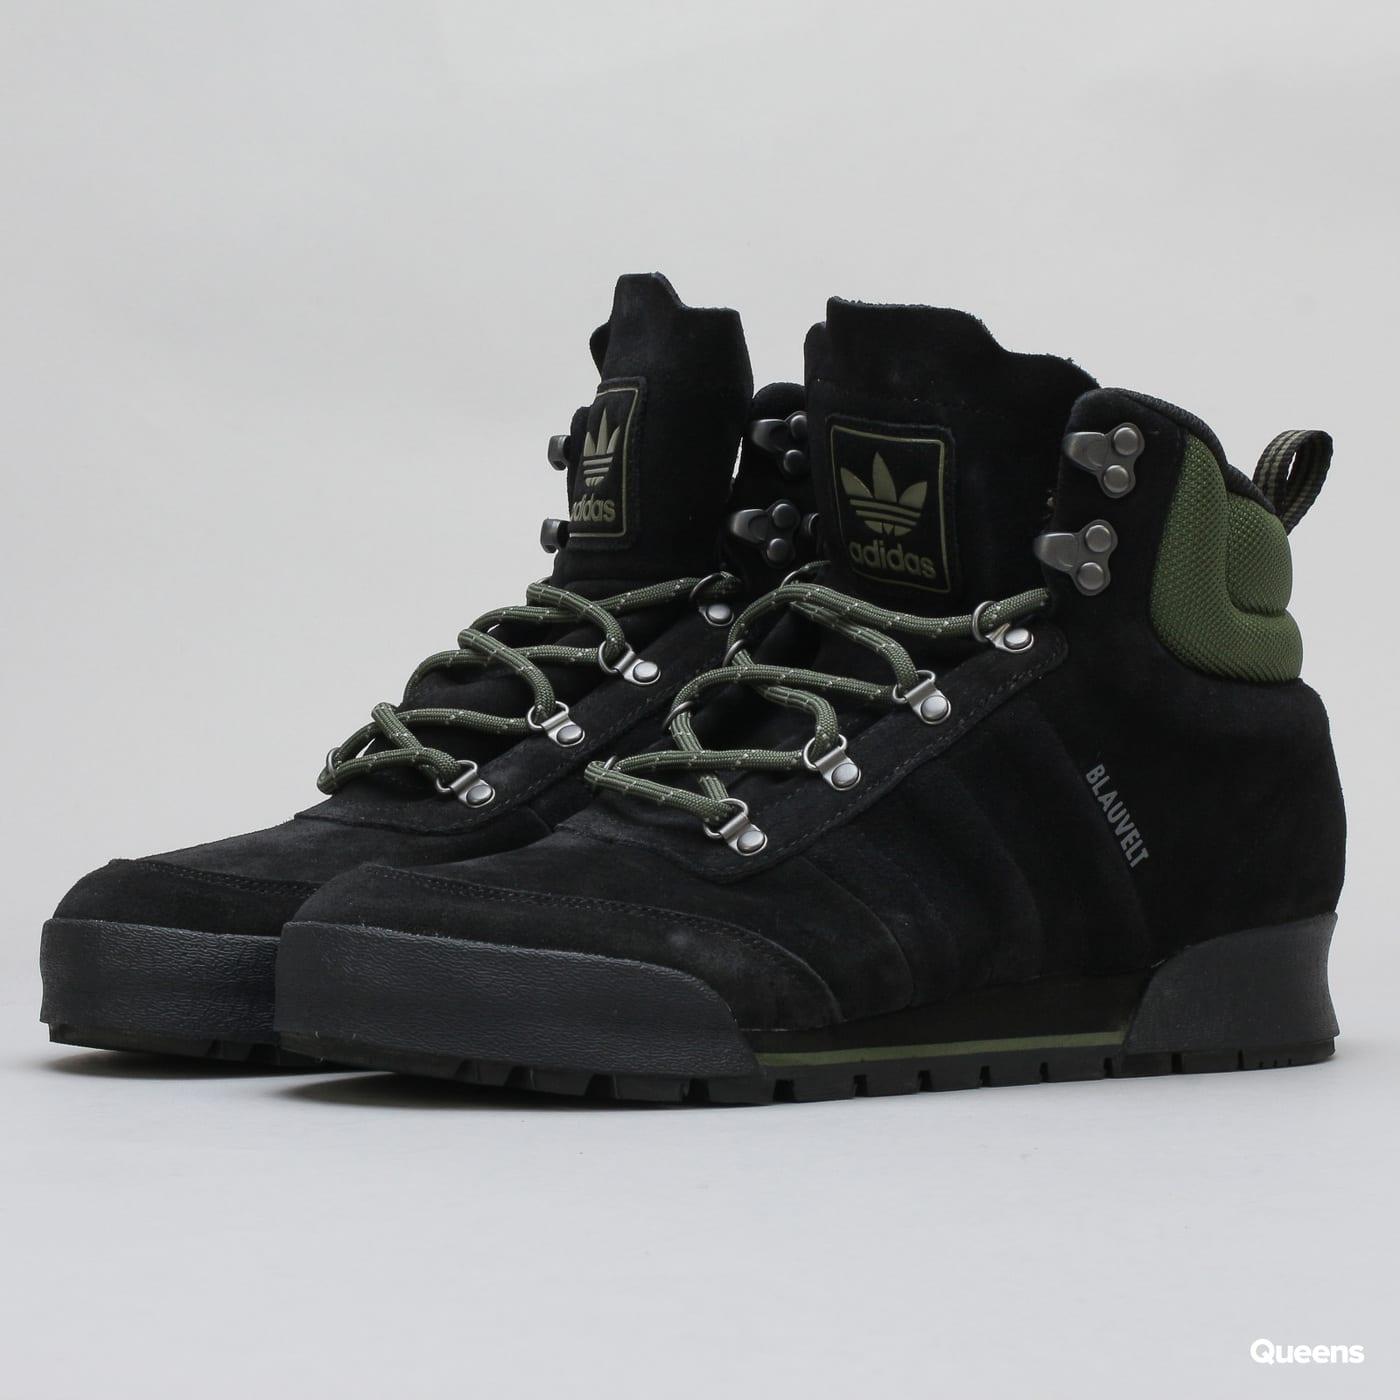 d64ba15ba Pánska zimná obuv adidas Jake Boot 2.0 cblack / basgrn / cblack (B41494) –  Queens 💚